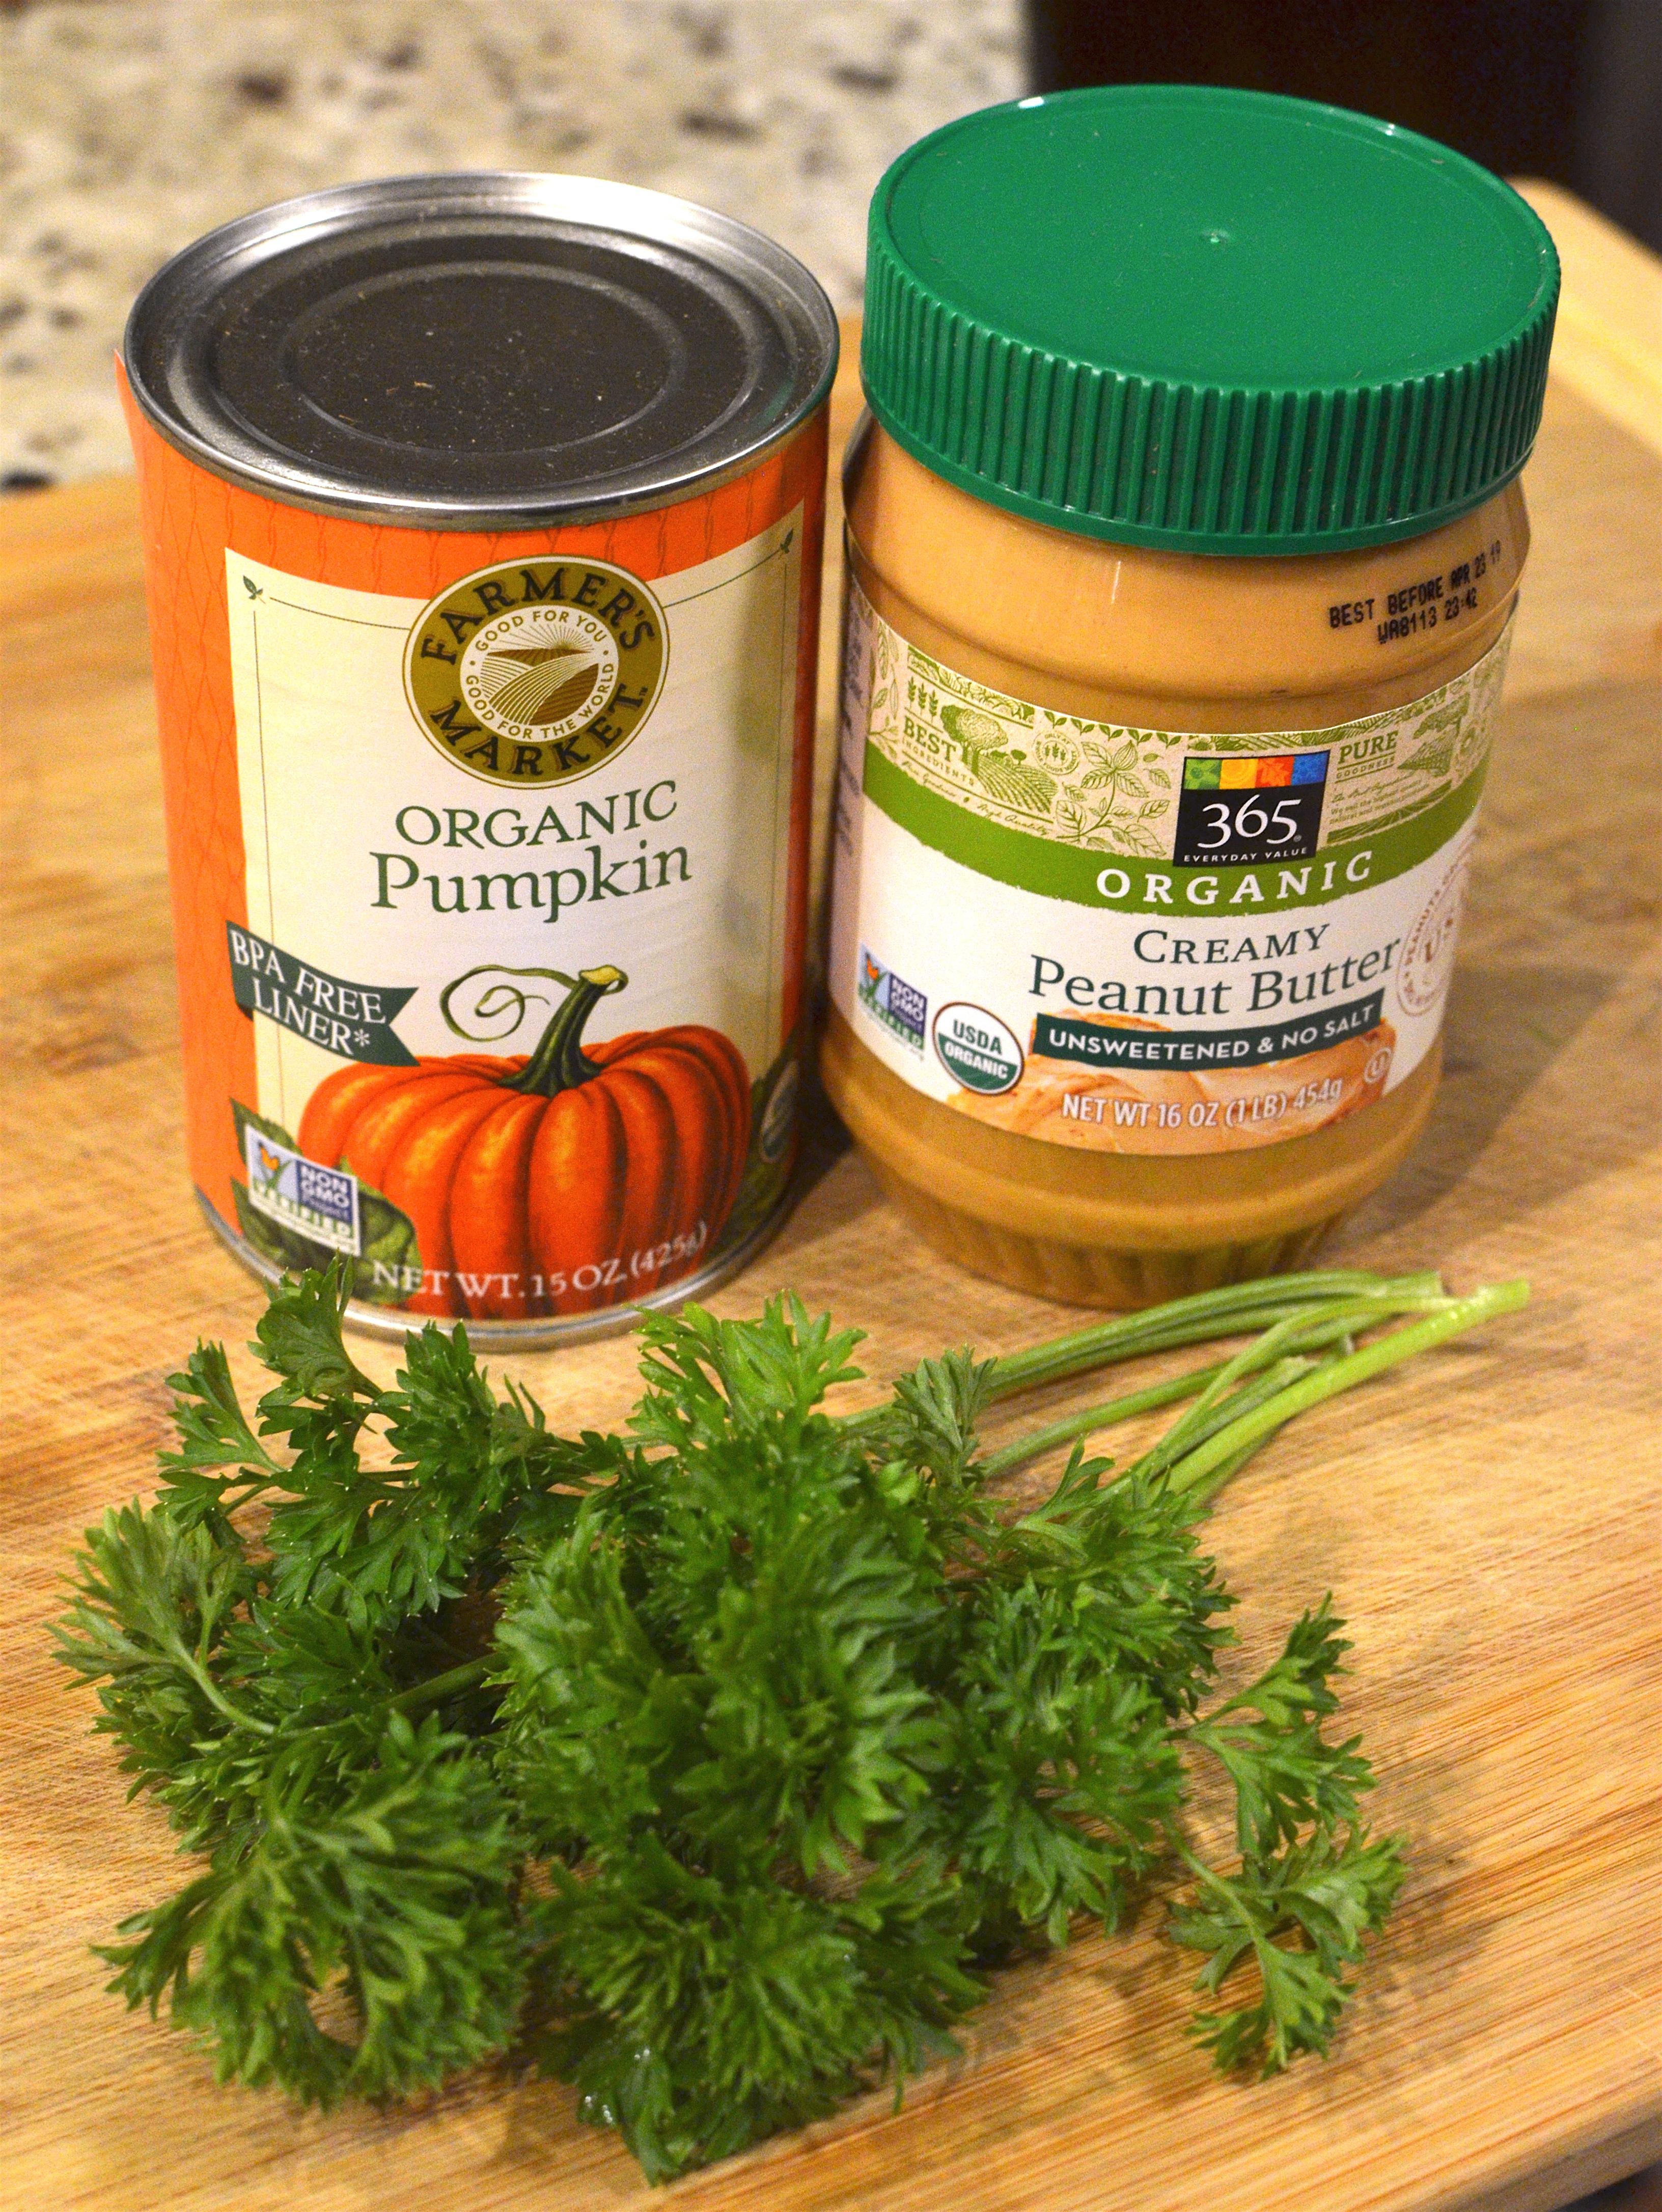 Picture of Prismo's Peanut Pumpkin Parsley Treats